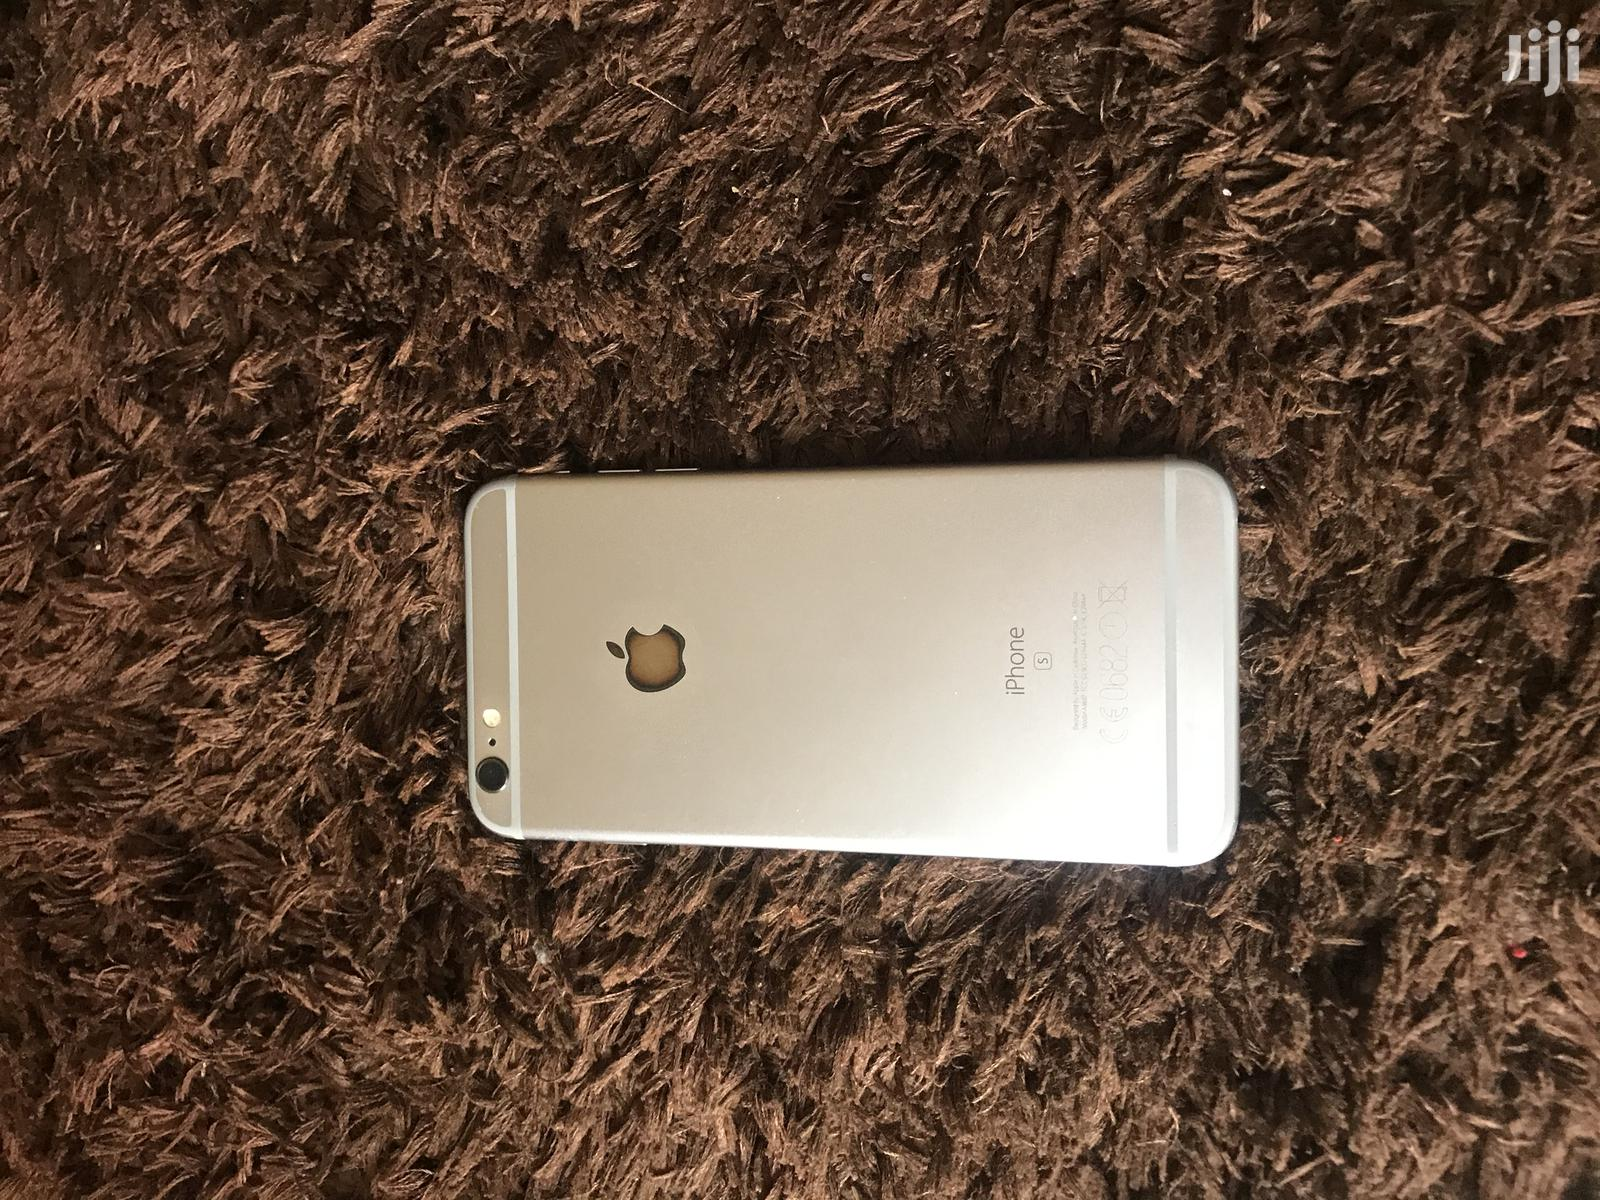 Apple iPhone 6s Plus 64 GB Black   Mobile Phones for sale in Kampala, Central Region, Uganda